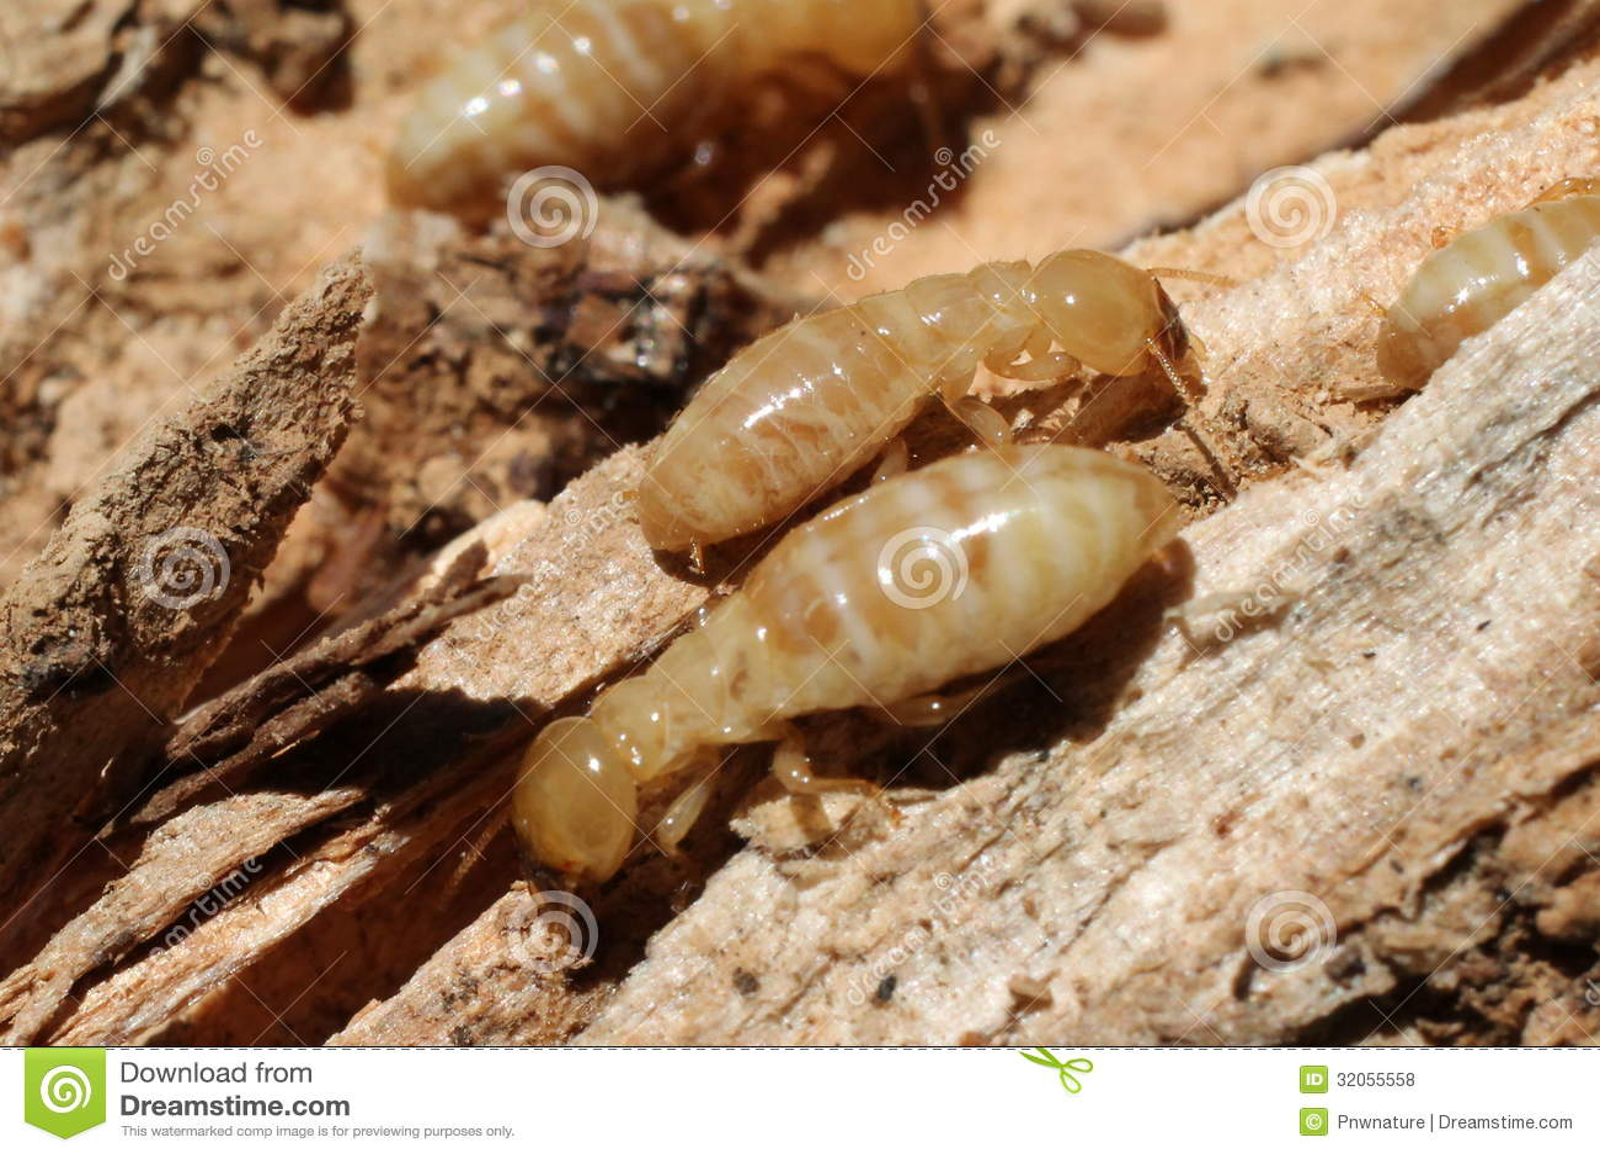 Termite worker - photo#14